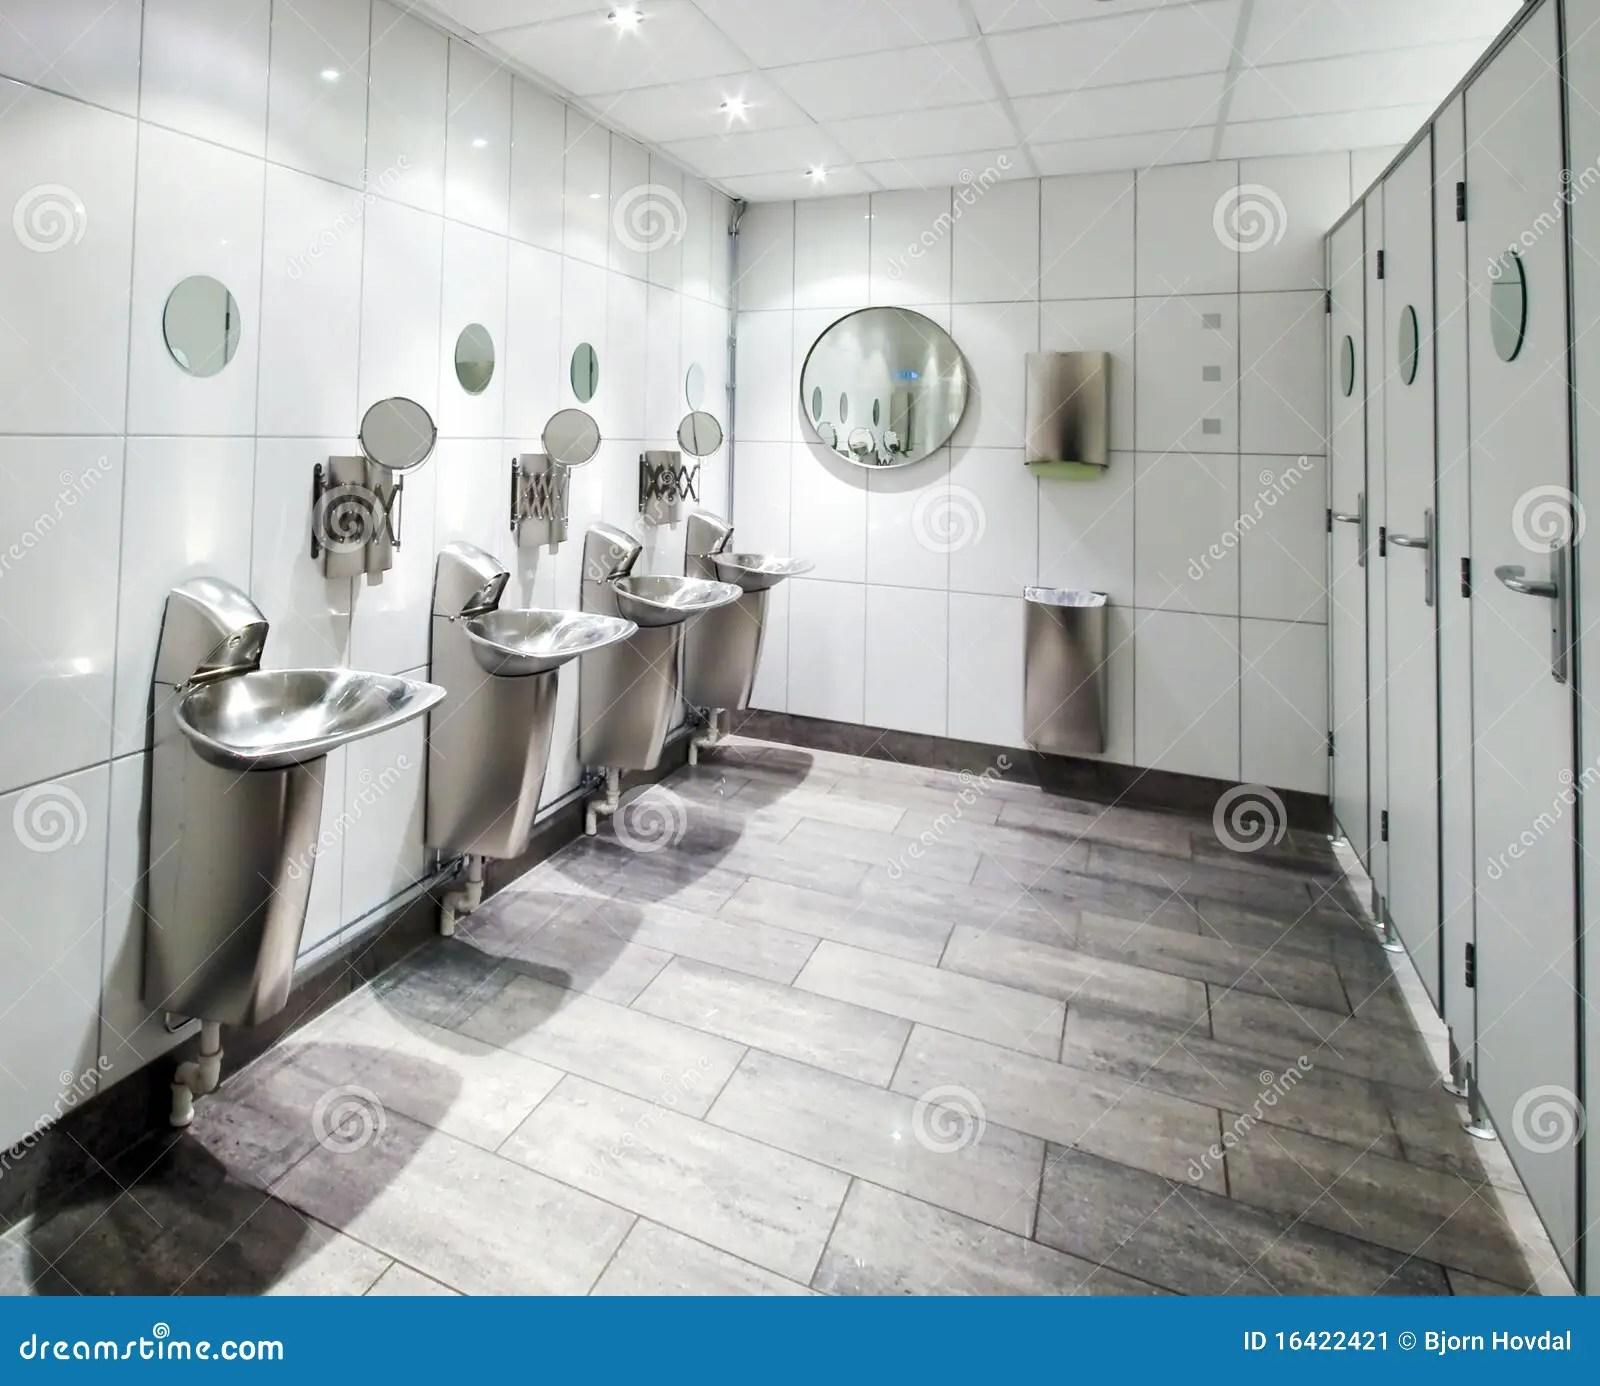 Plan Your Bathroom 3d